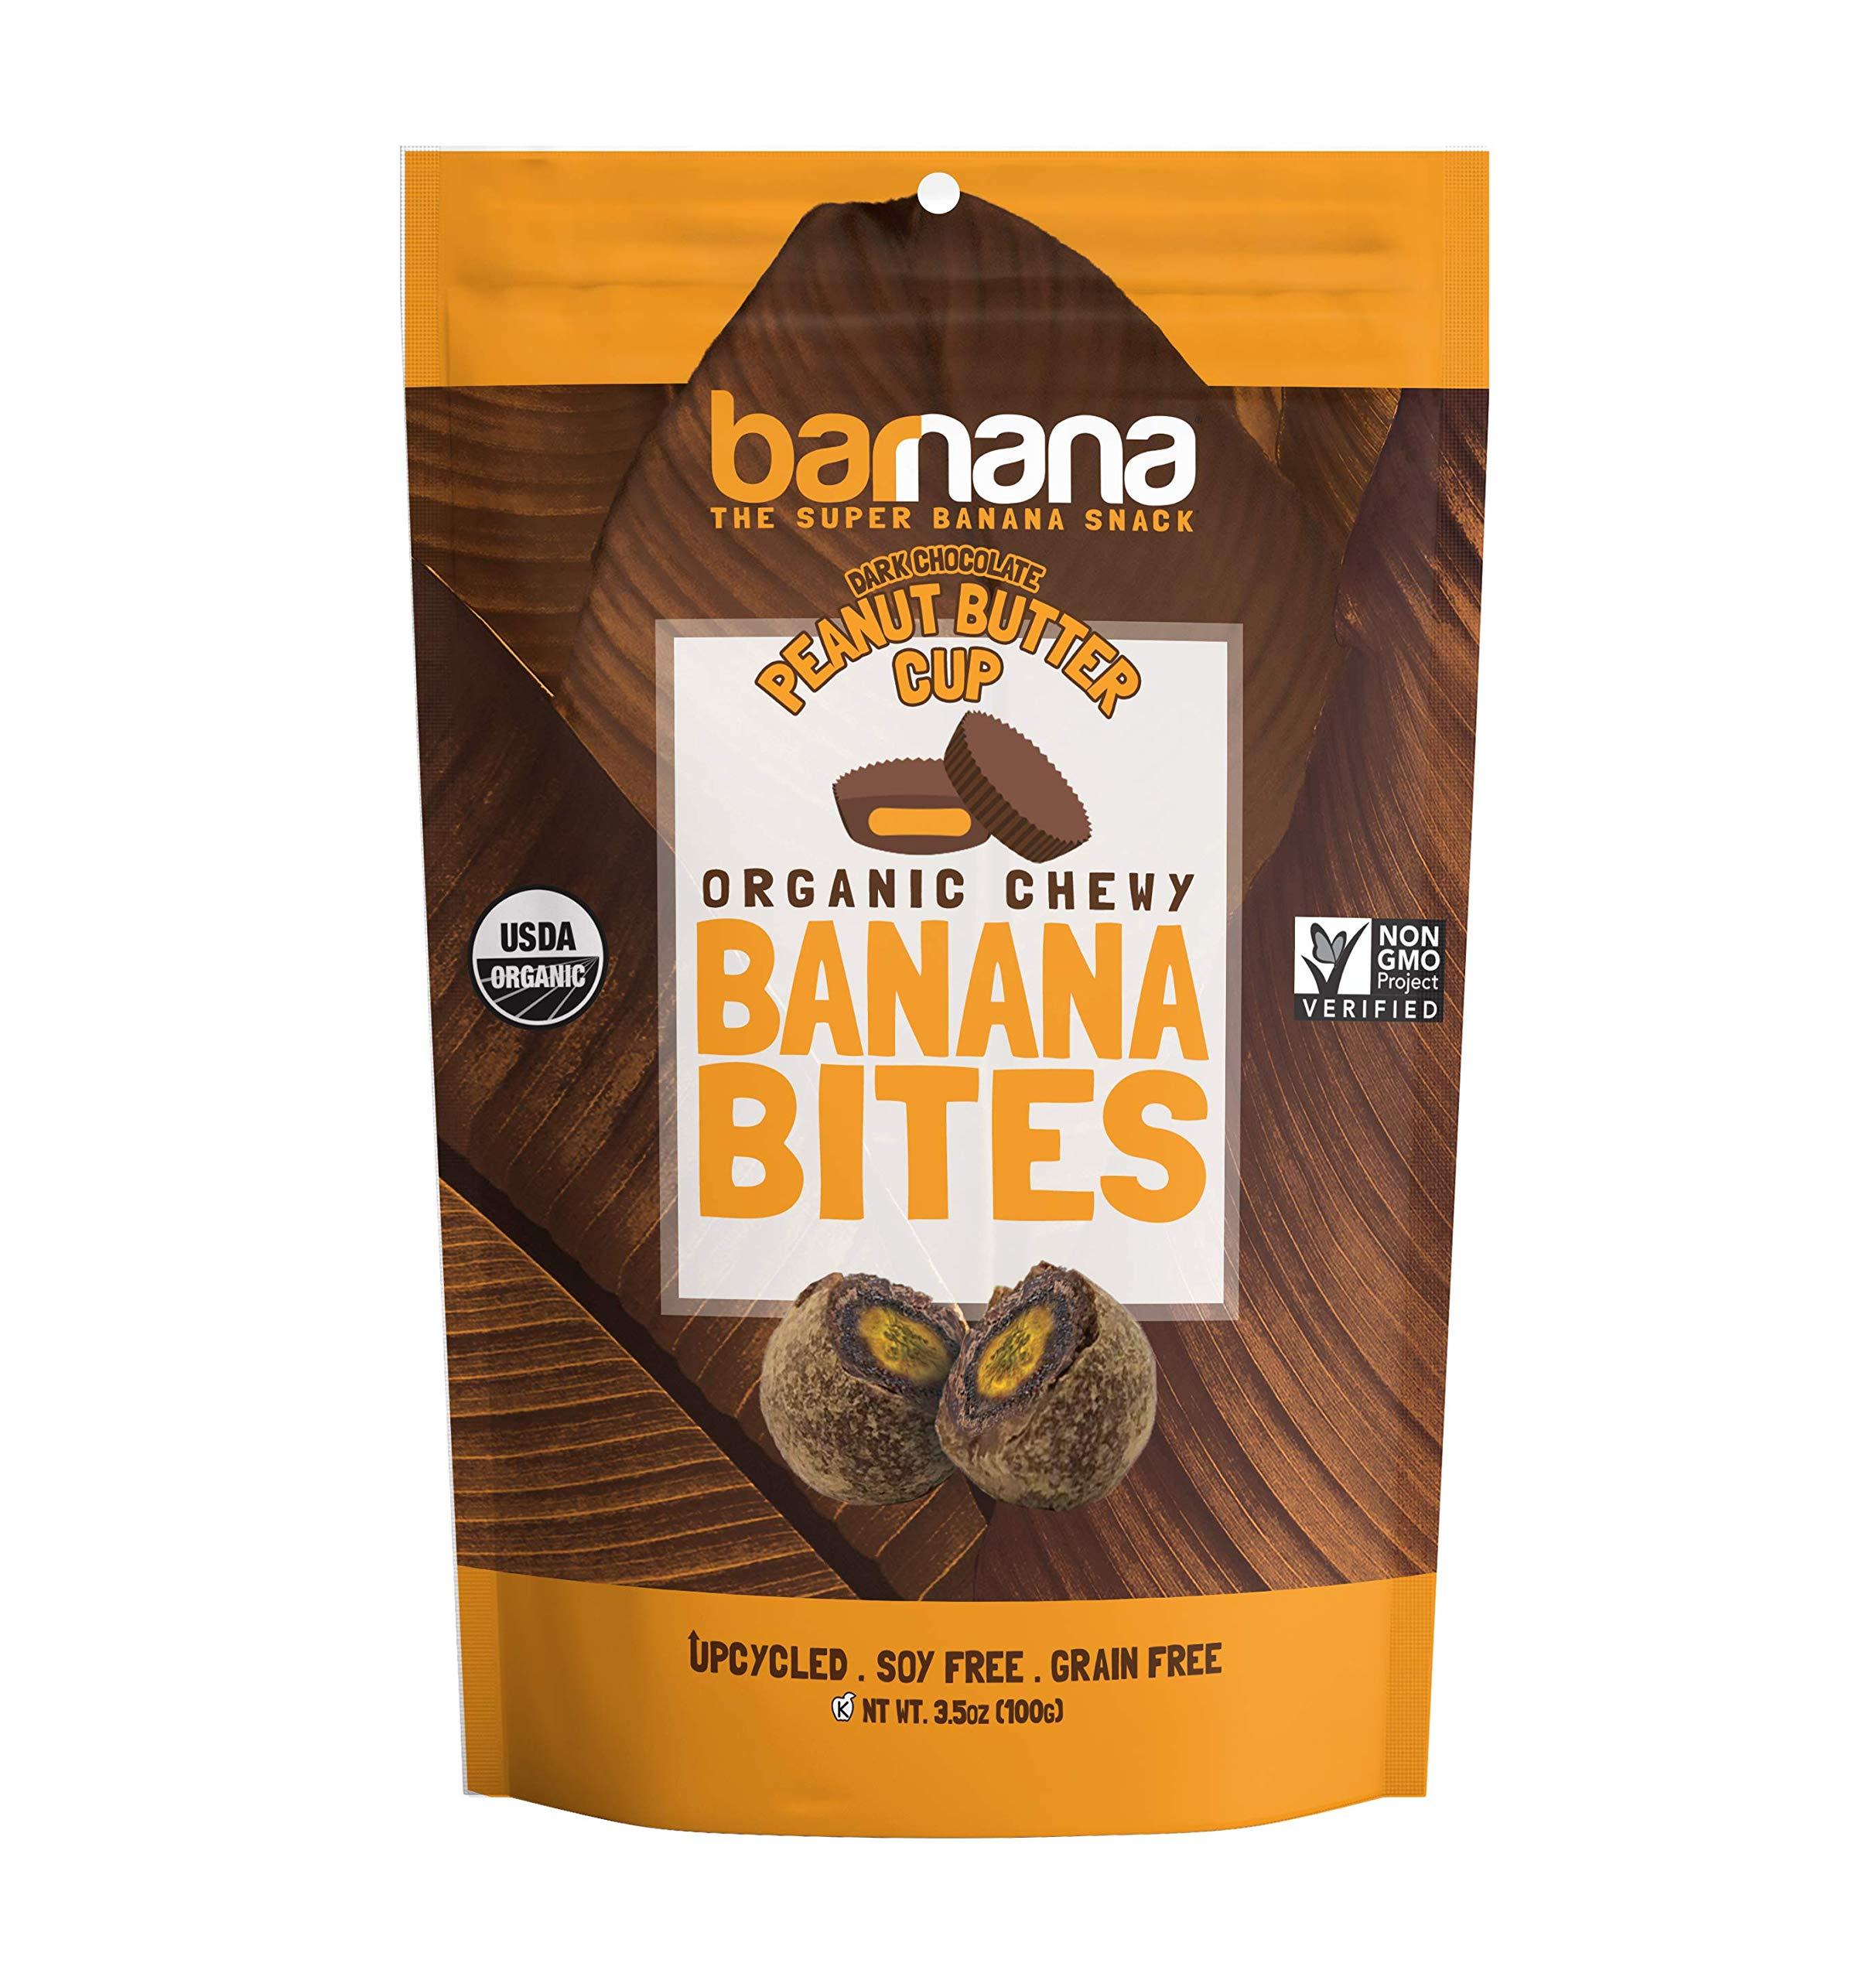 Barnana Organic Chewy Banana Bites - PB Cup -3.5 Ounce - Delicious Barnana Potassium Rich Banana Snacks - Lunch Dinner Sports Hiking Natural Snack - Whole 30, Paleo, Vegatarian by Barnana